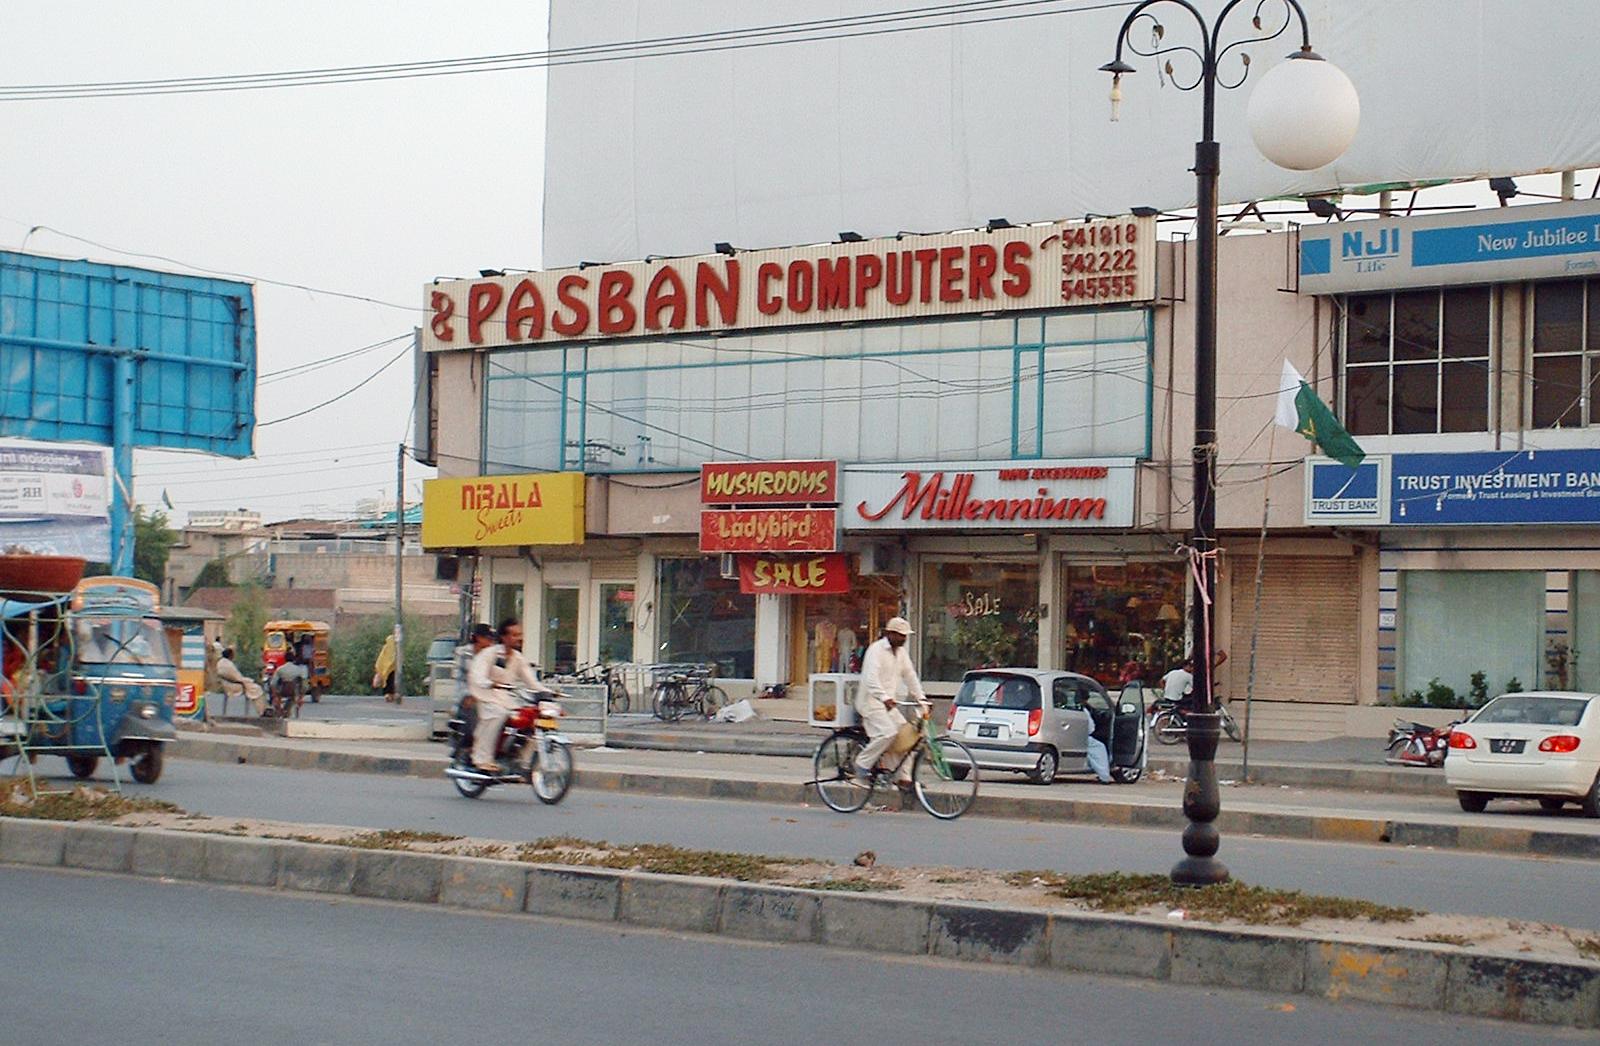 Dating Points In Faisalabad - bessavalleycom